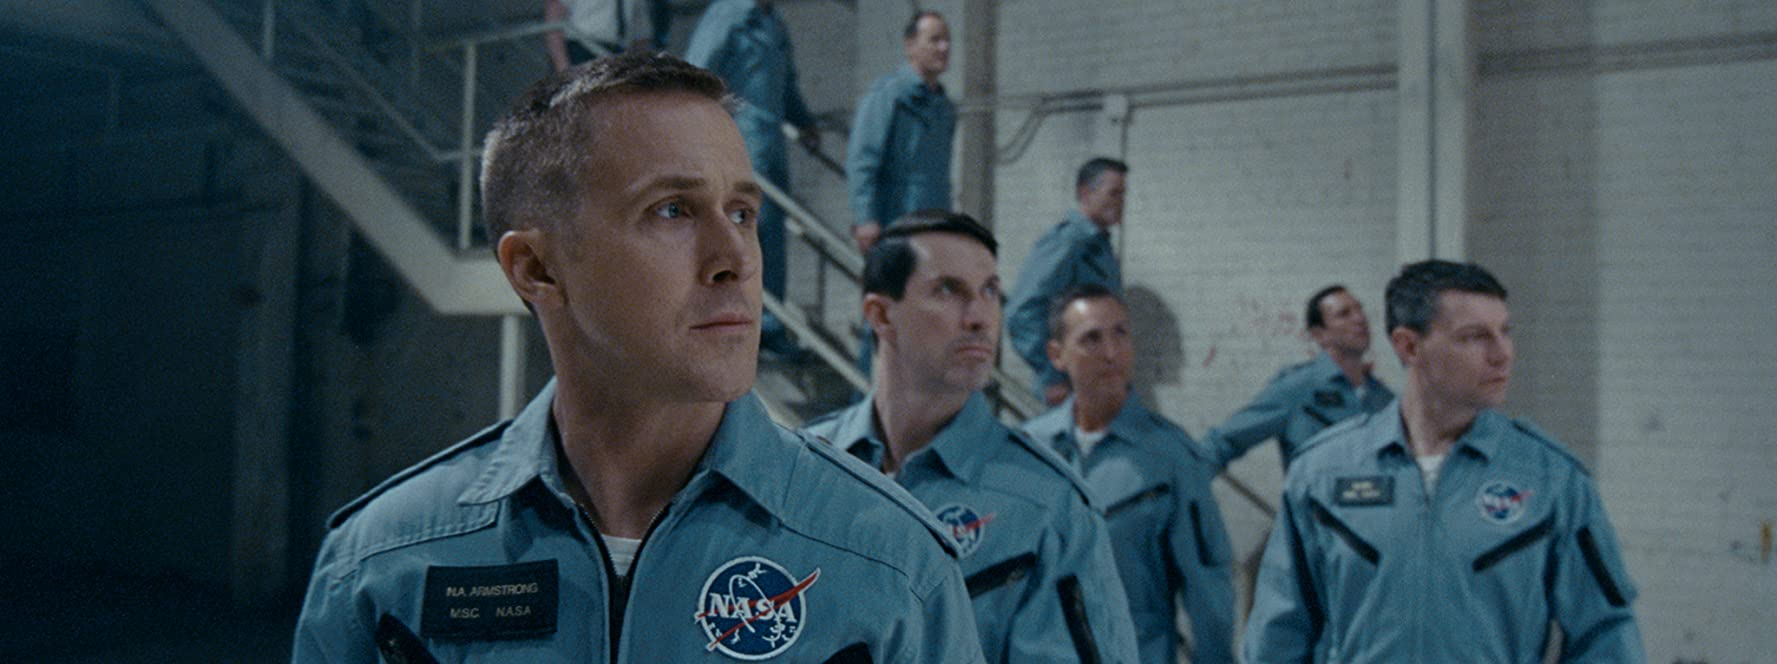 Patrick Fugit, Ryan Gosling, and Shawn Eric Jones in First Man (2018)